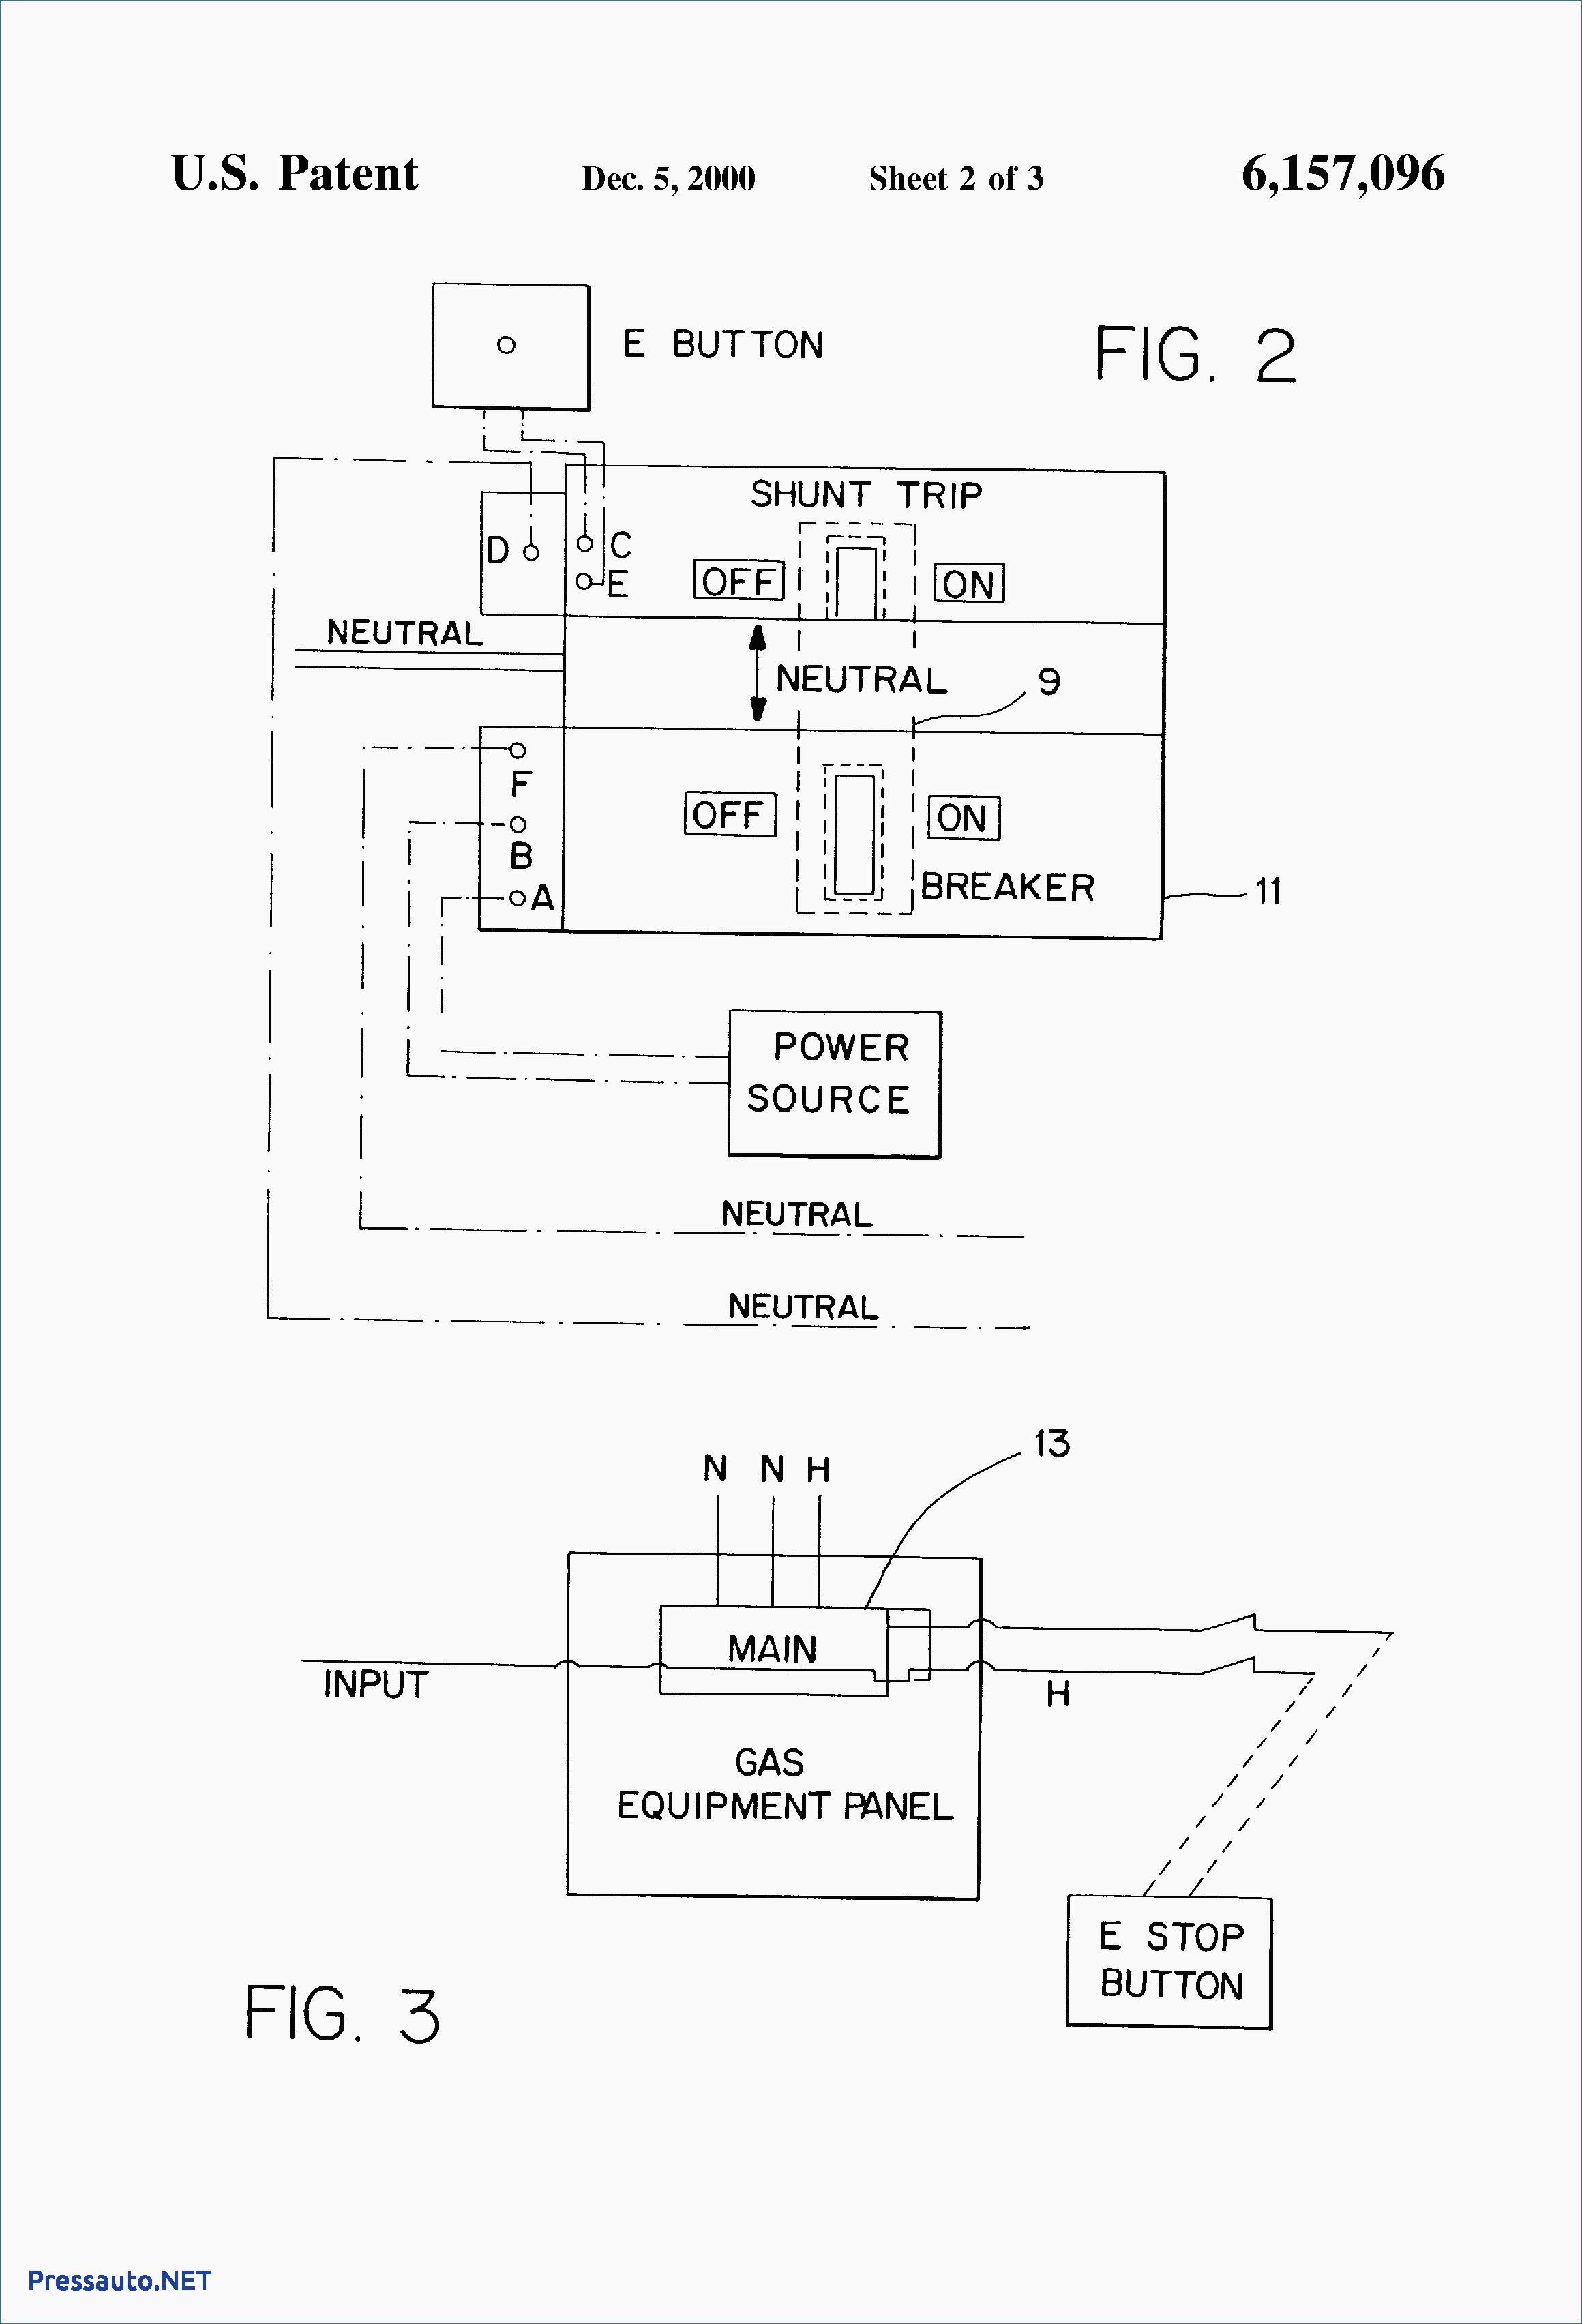 30 Elevator Shunt Trip Wiring Diagram